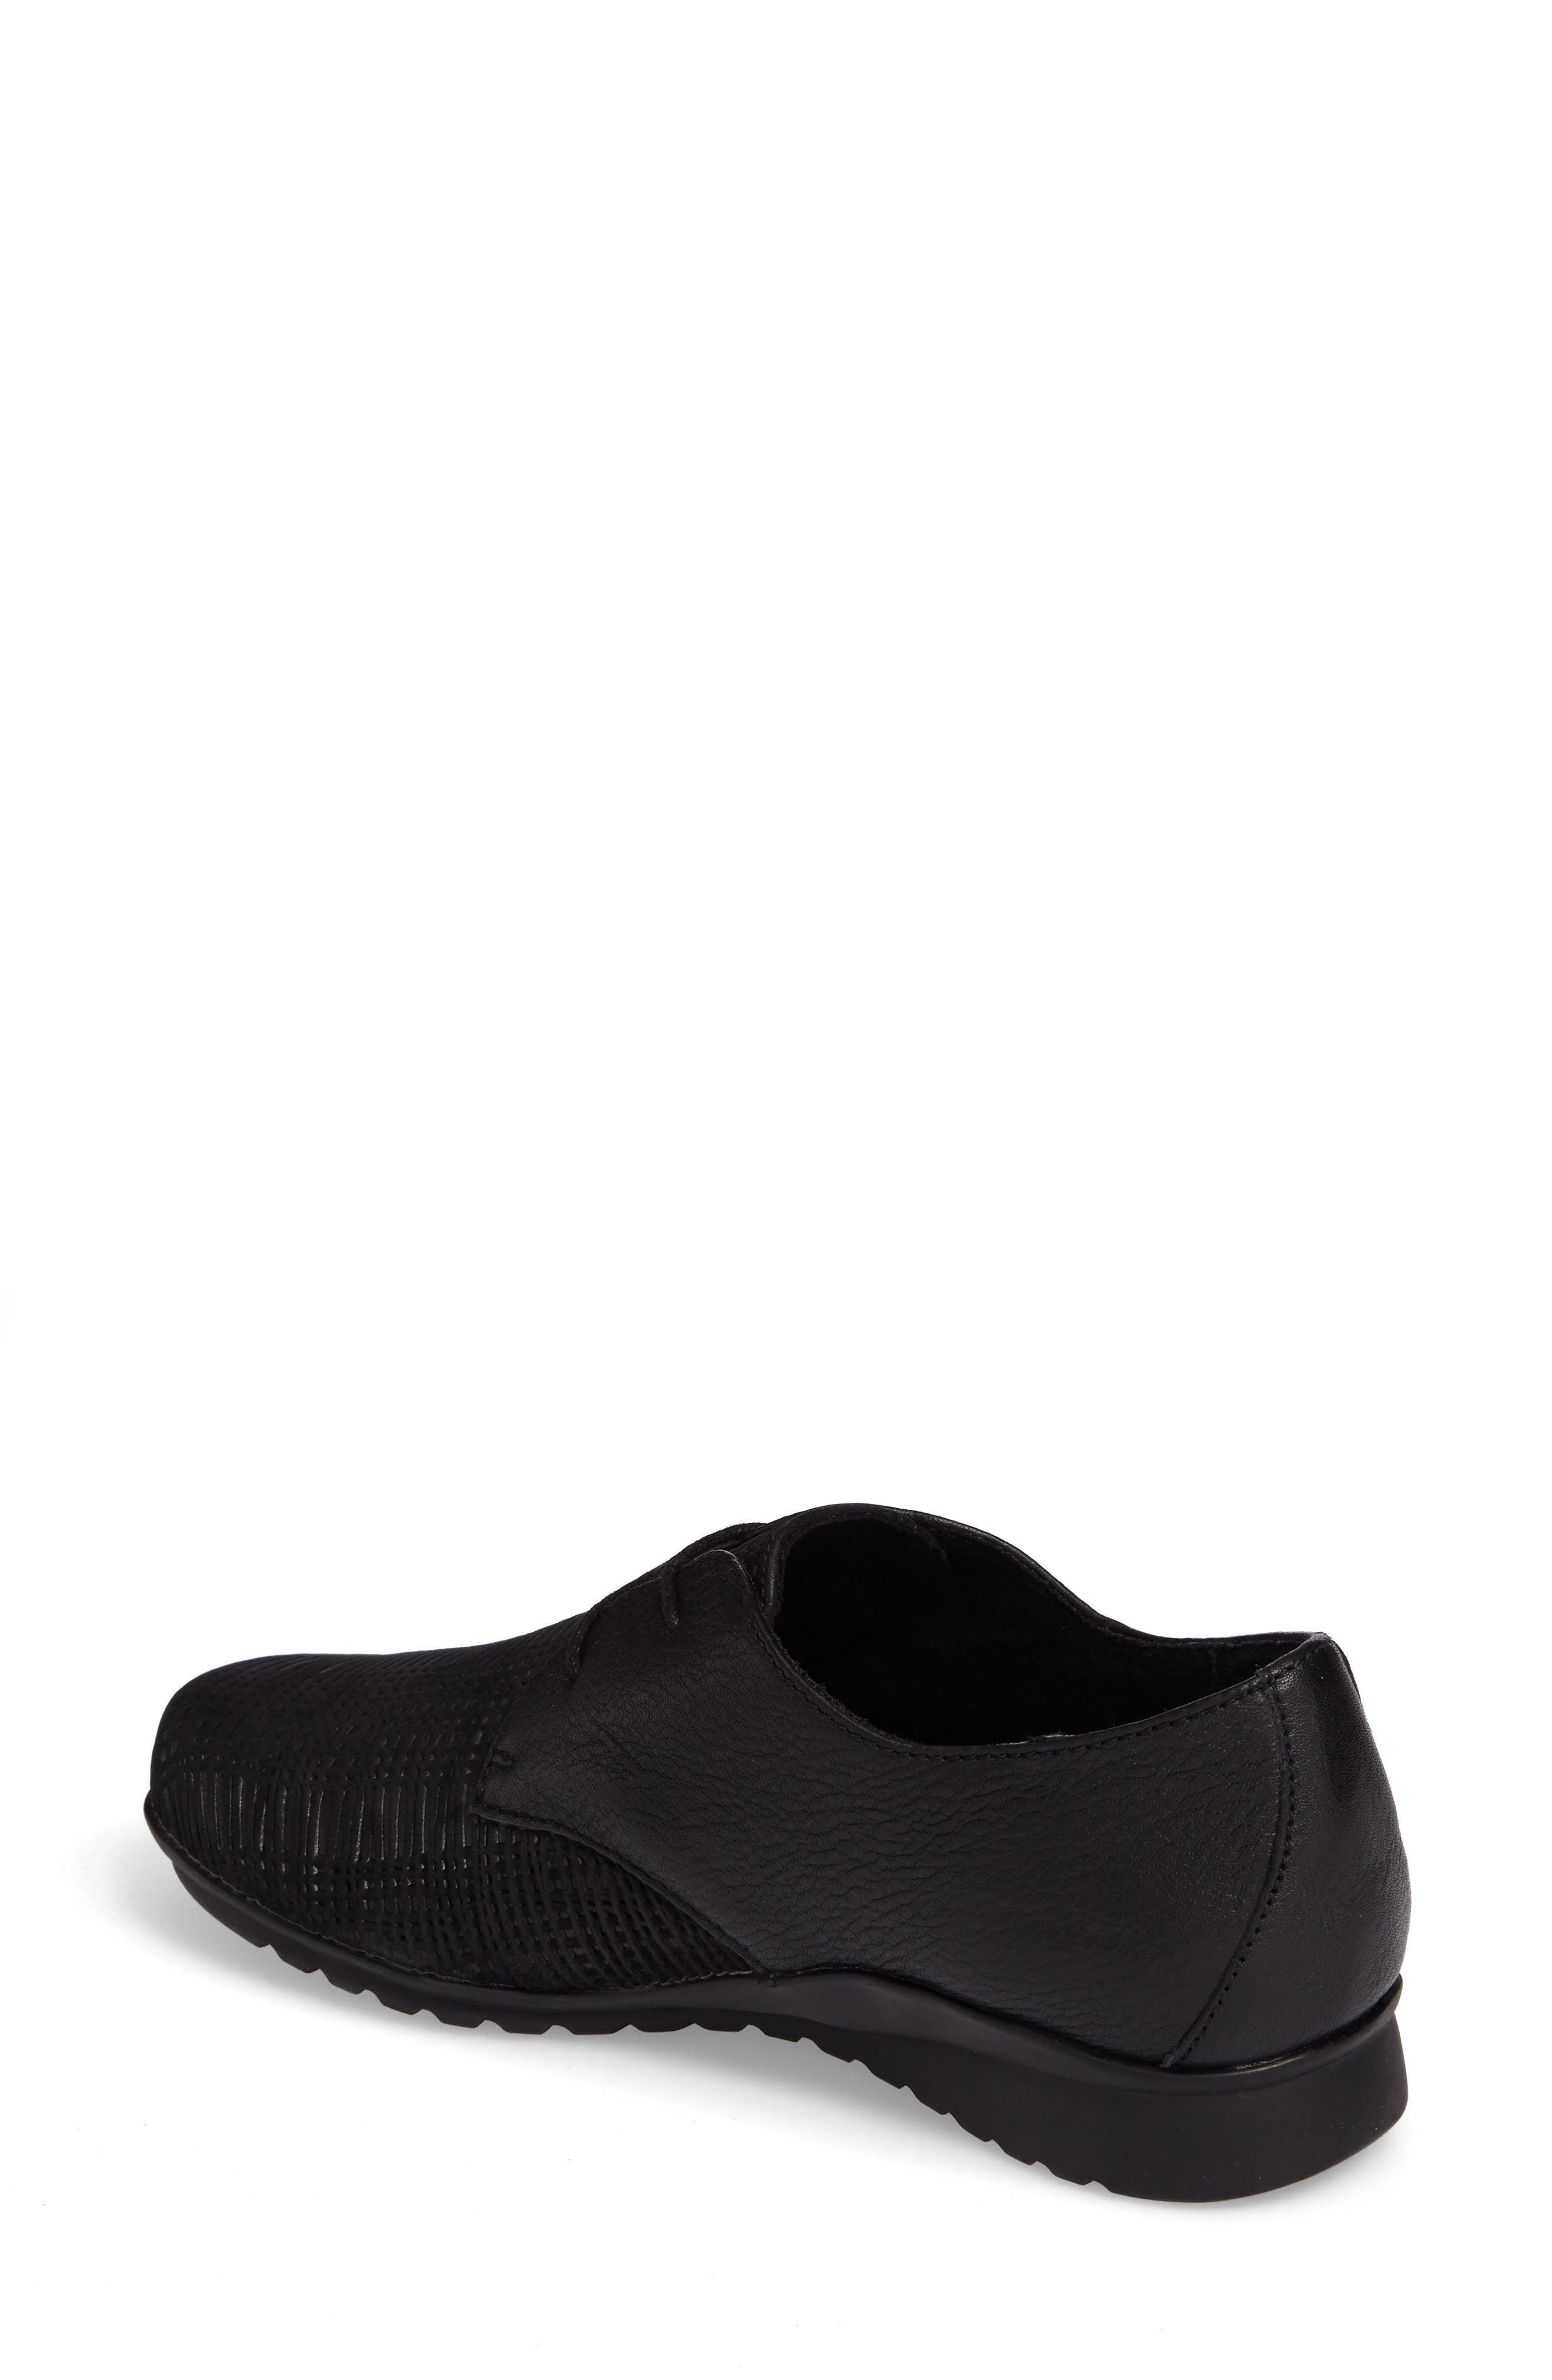 Alternate Image 2  - Aetrex Erin Saddle Shoe (Women)